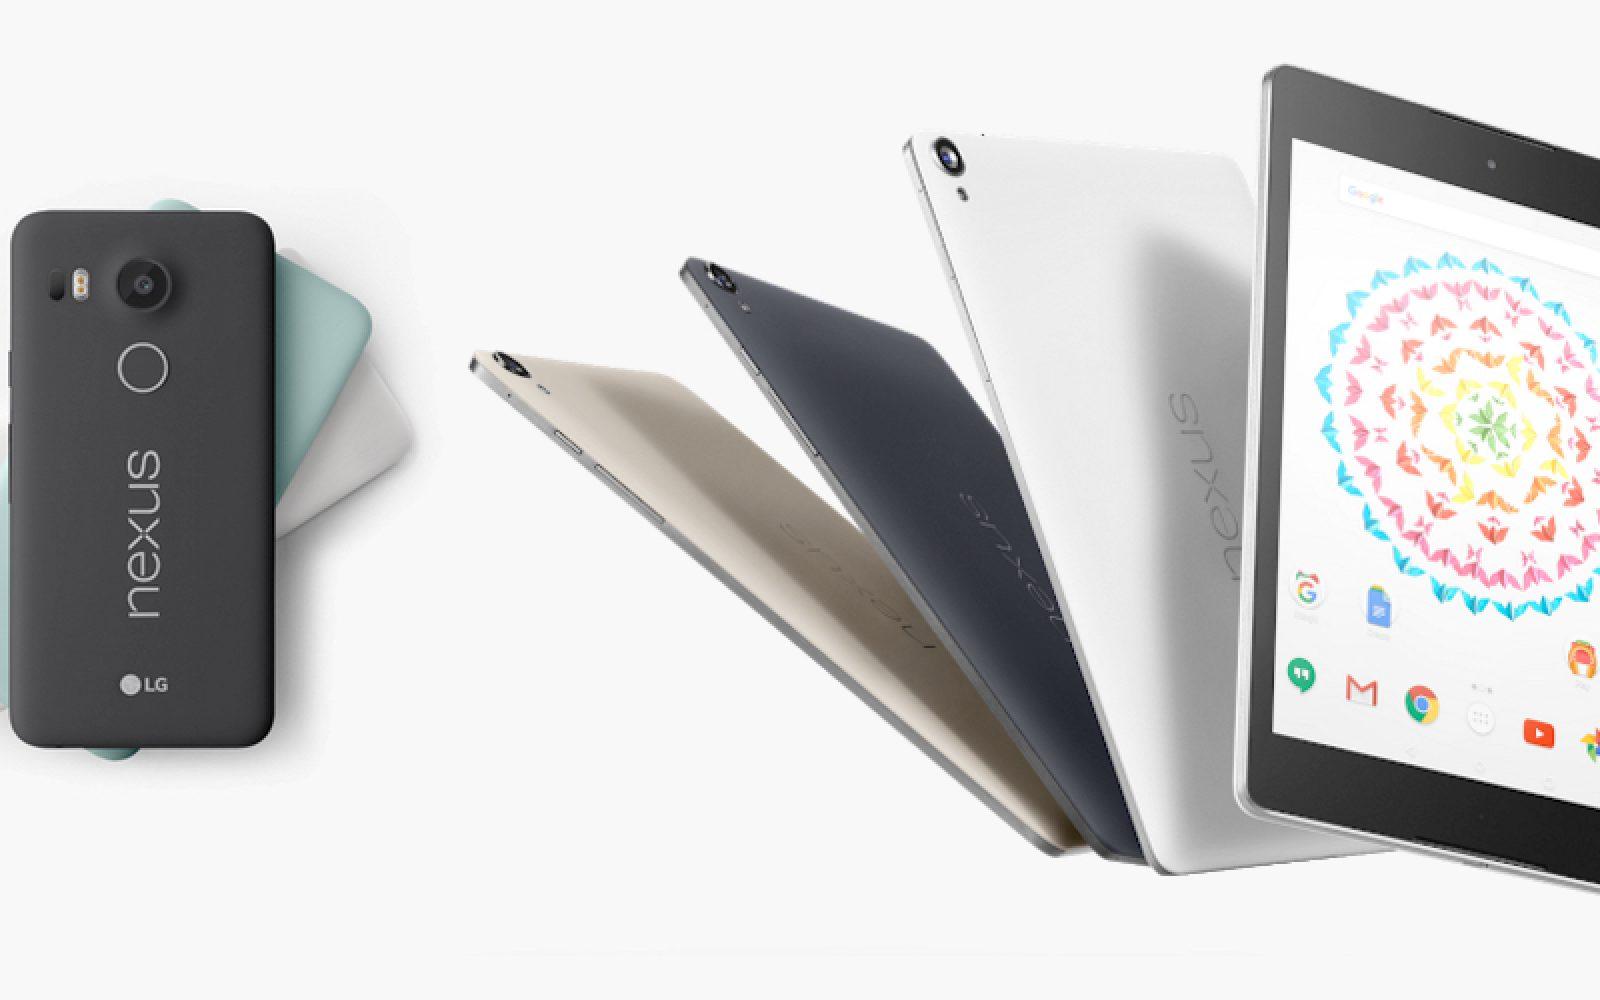 23c5ef56131618 Black Friday: Kindle price cuts, Nexus 5X $299, Nexus 9 $199, Galaxy S6  Edge $460, more